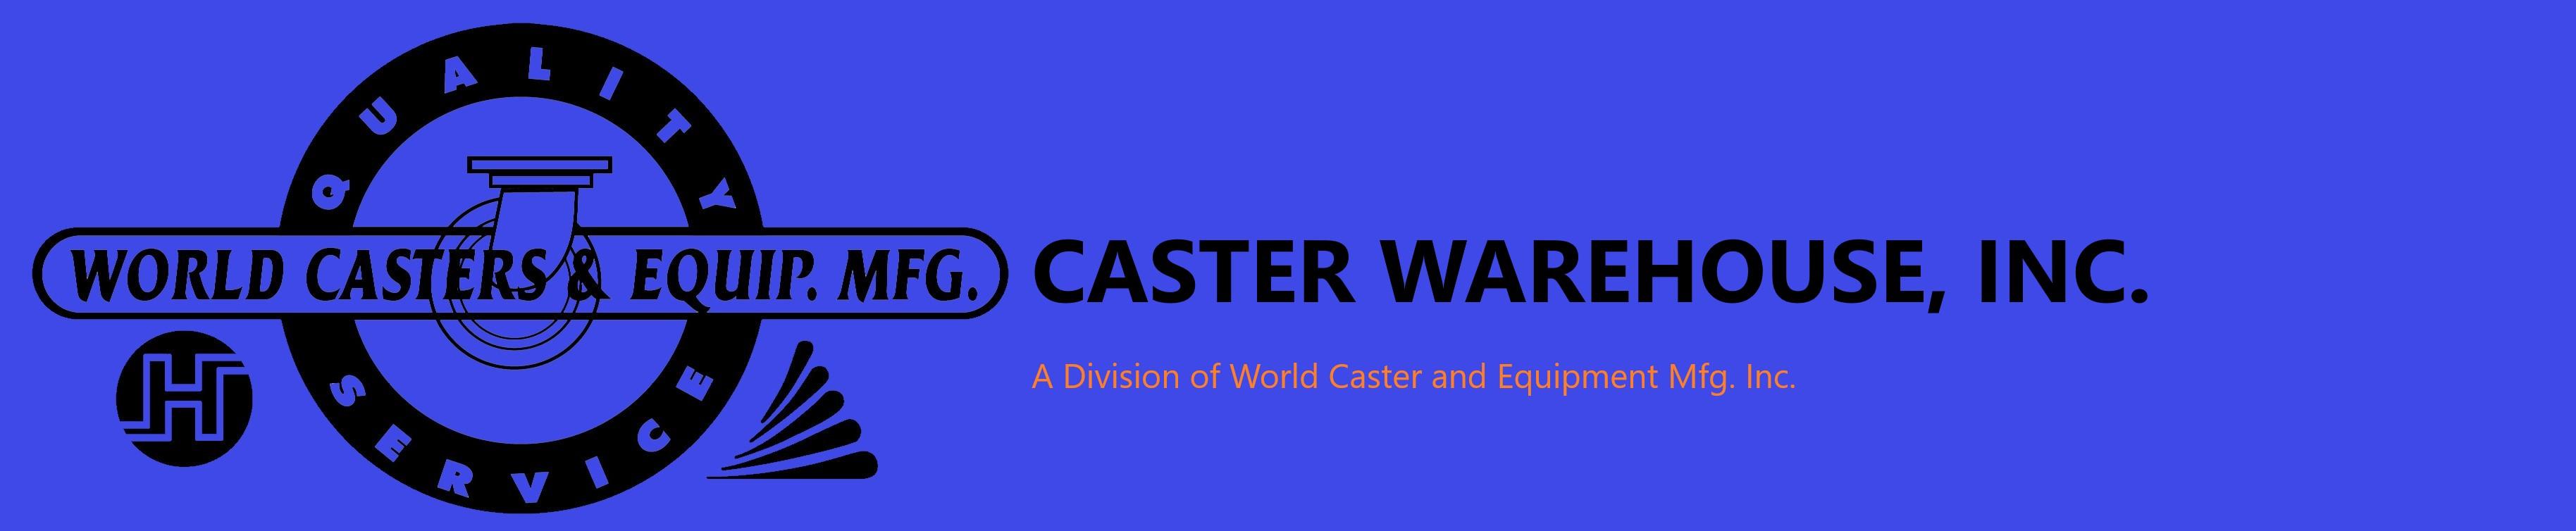 Caster Warehouse, inc.